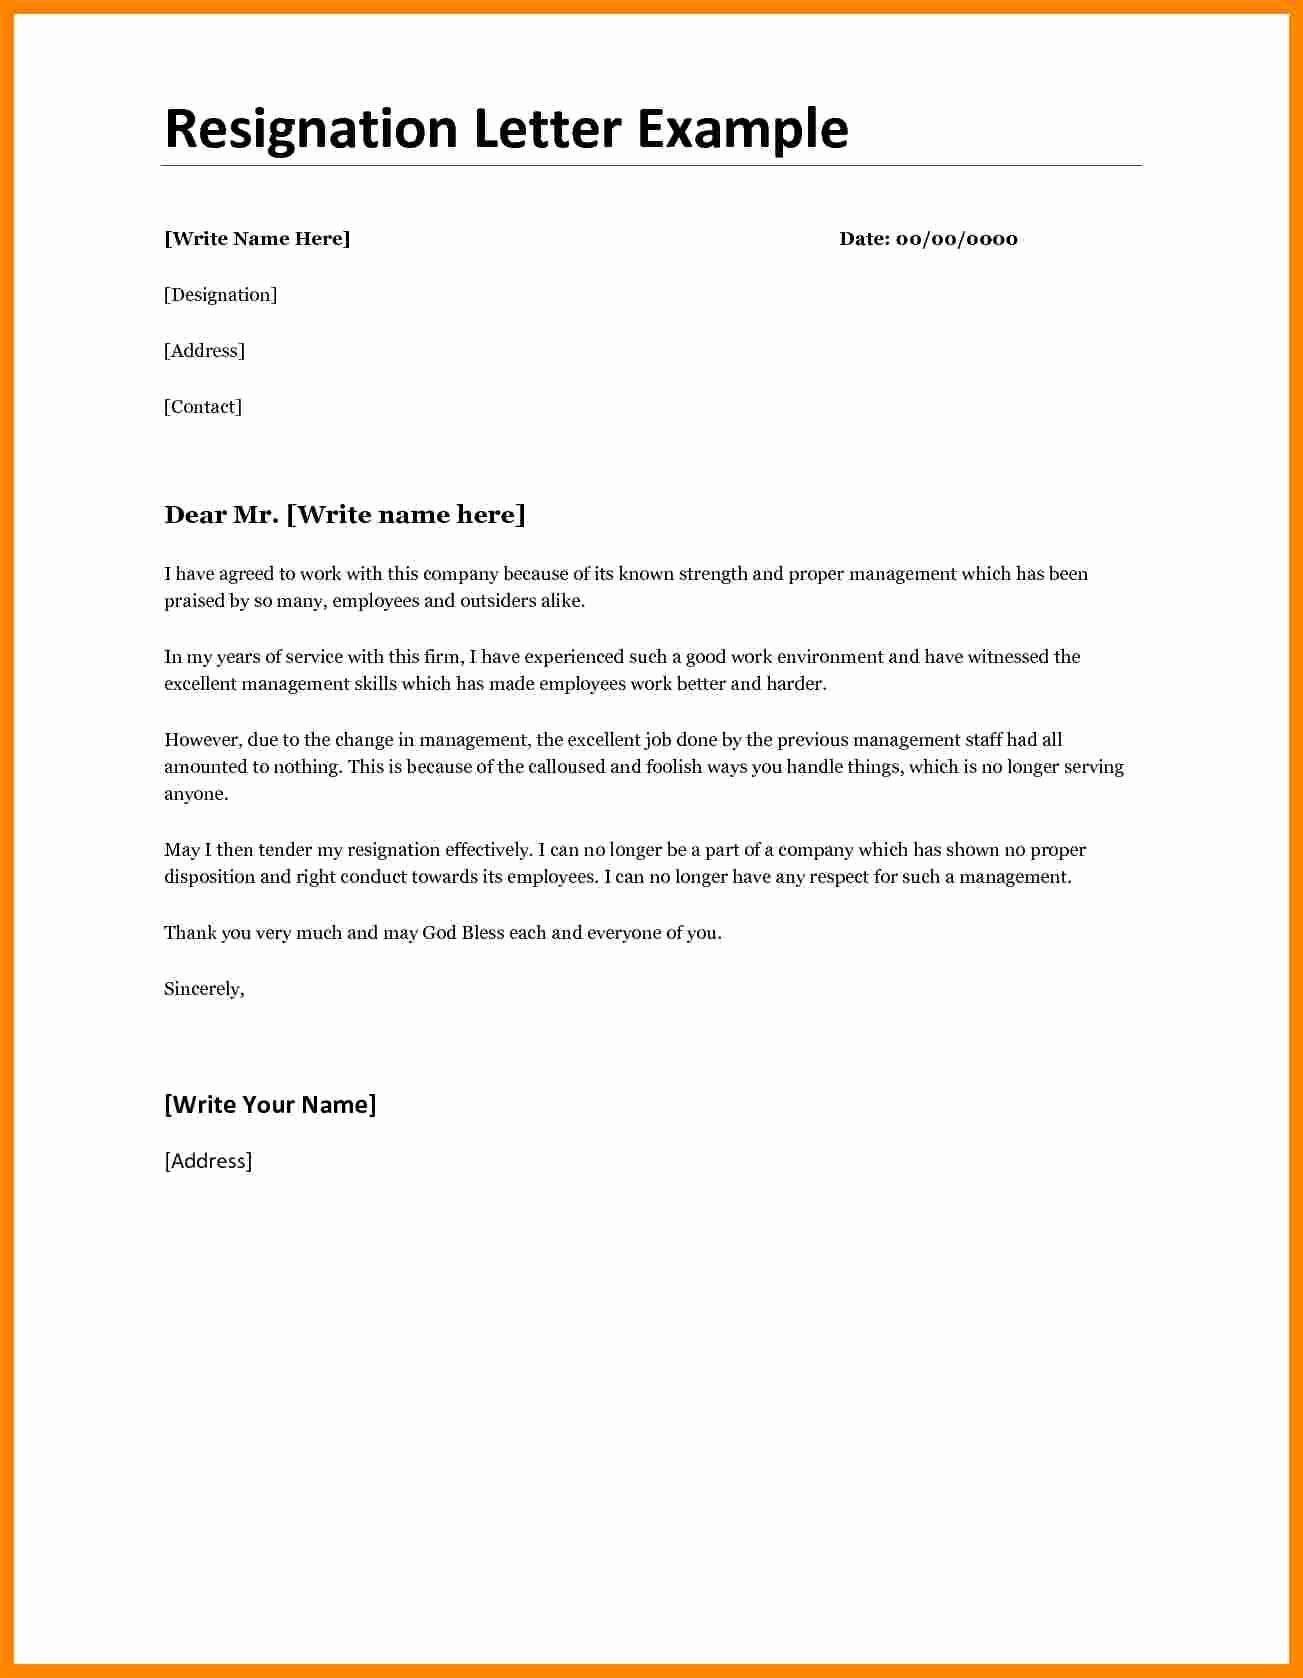 Letter Of Resignation Retirement Example Luxury 11 Notice Letters Of Resignation Due to Retirement